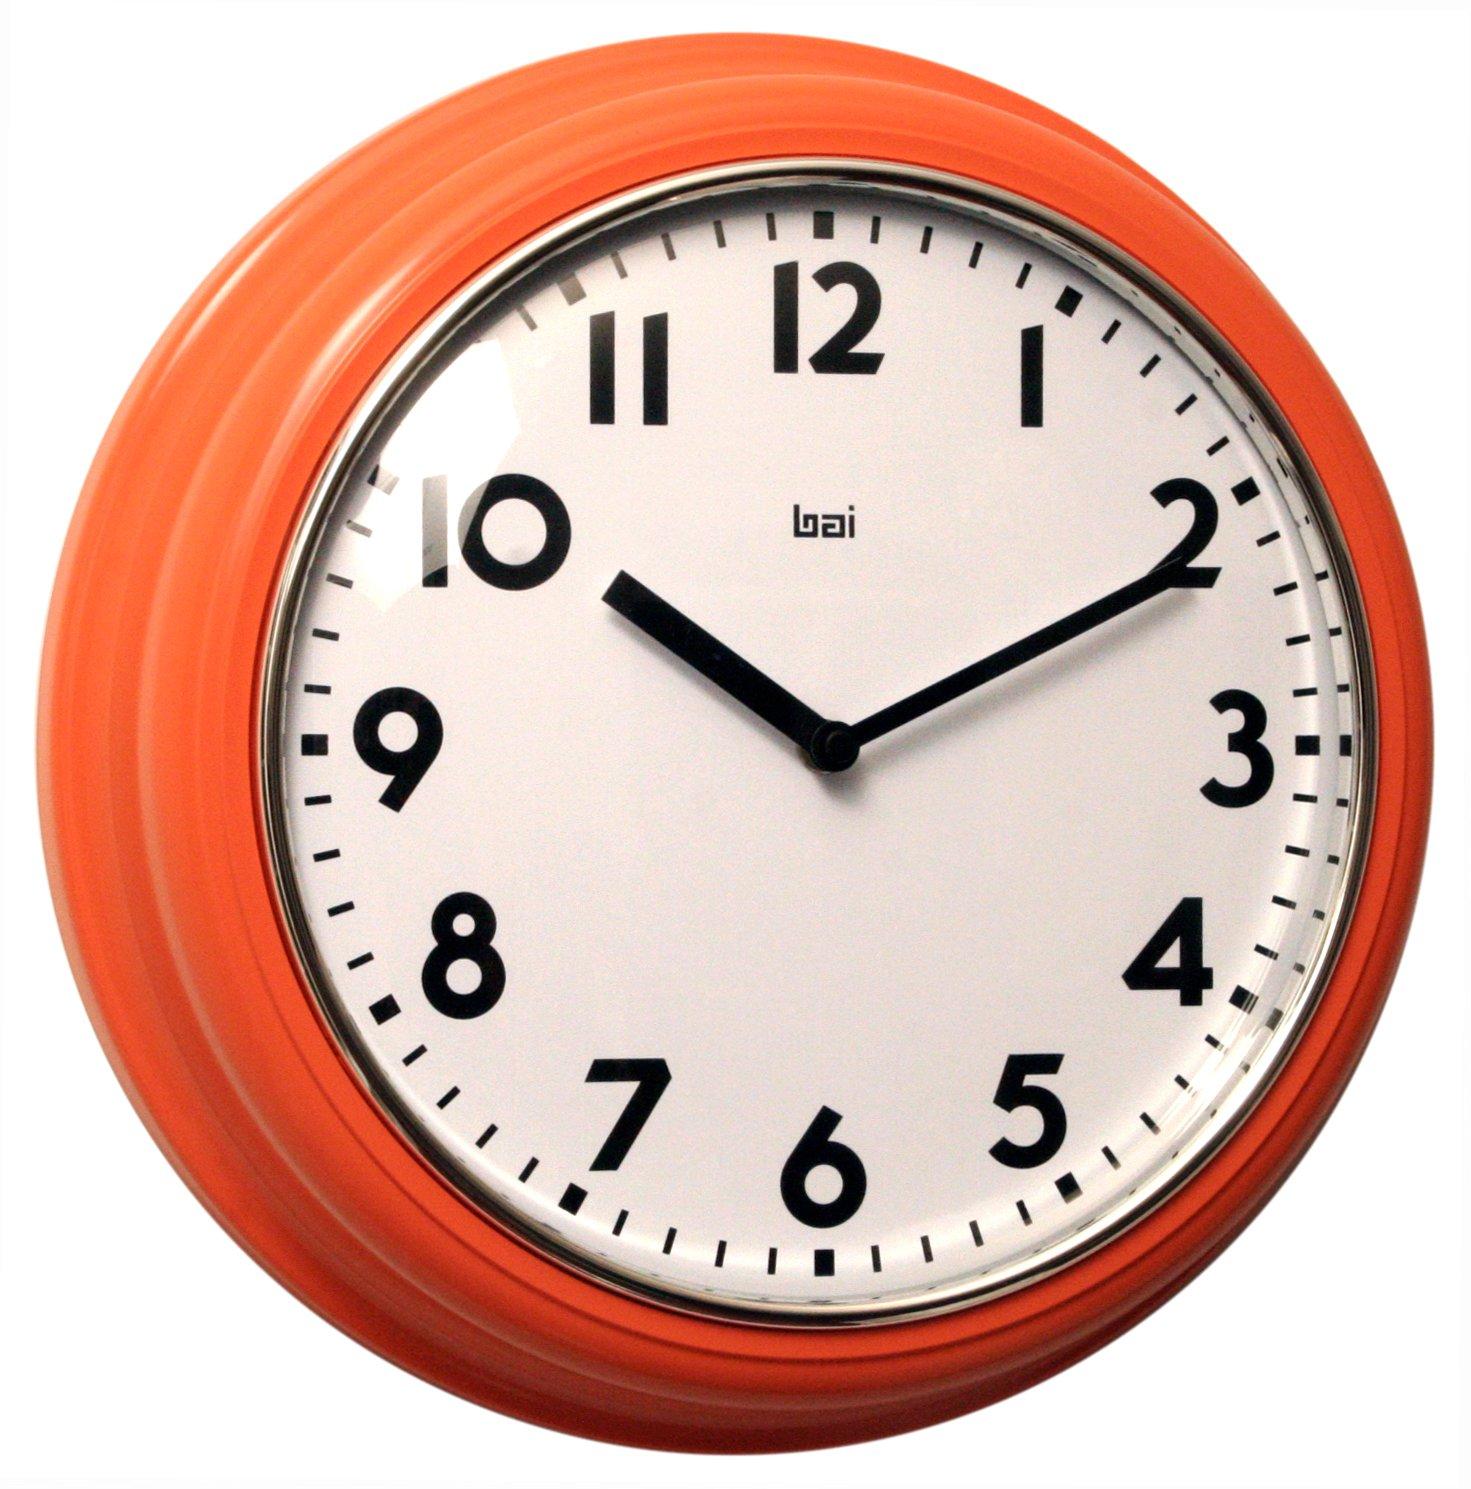 Bai School Wall Clock Orange